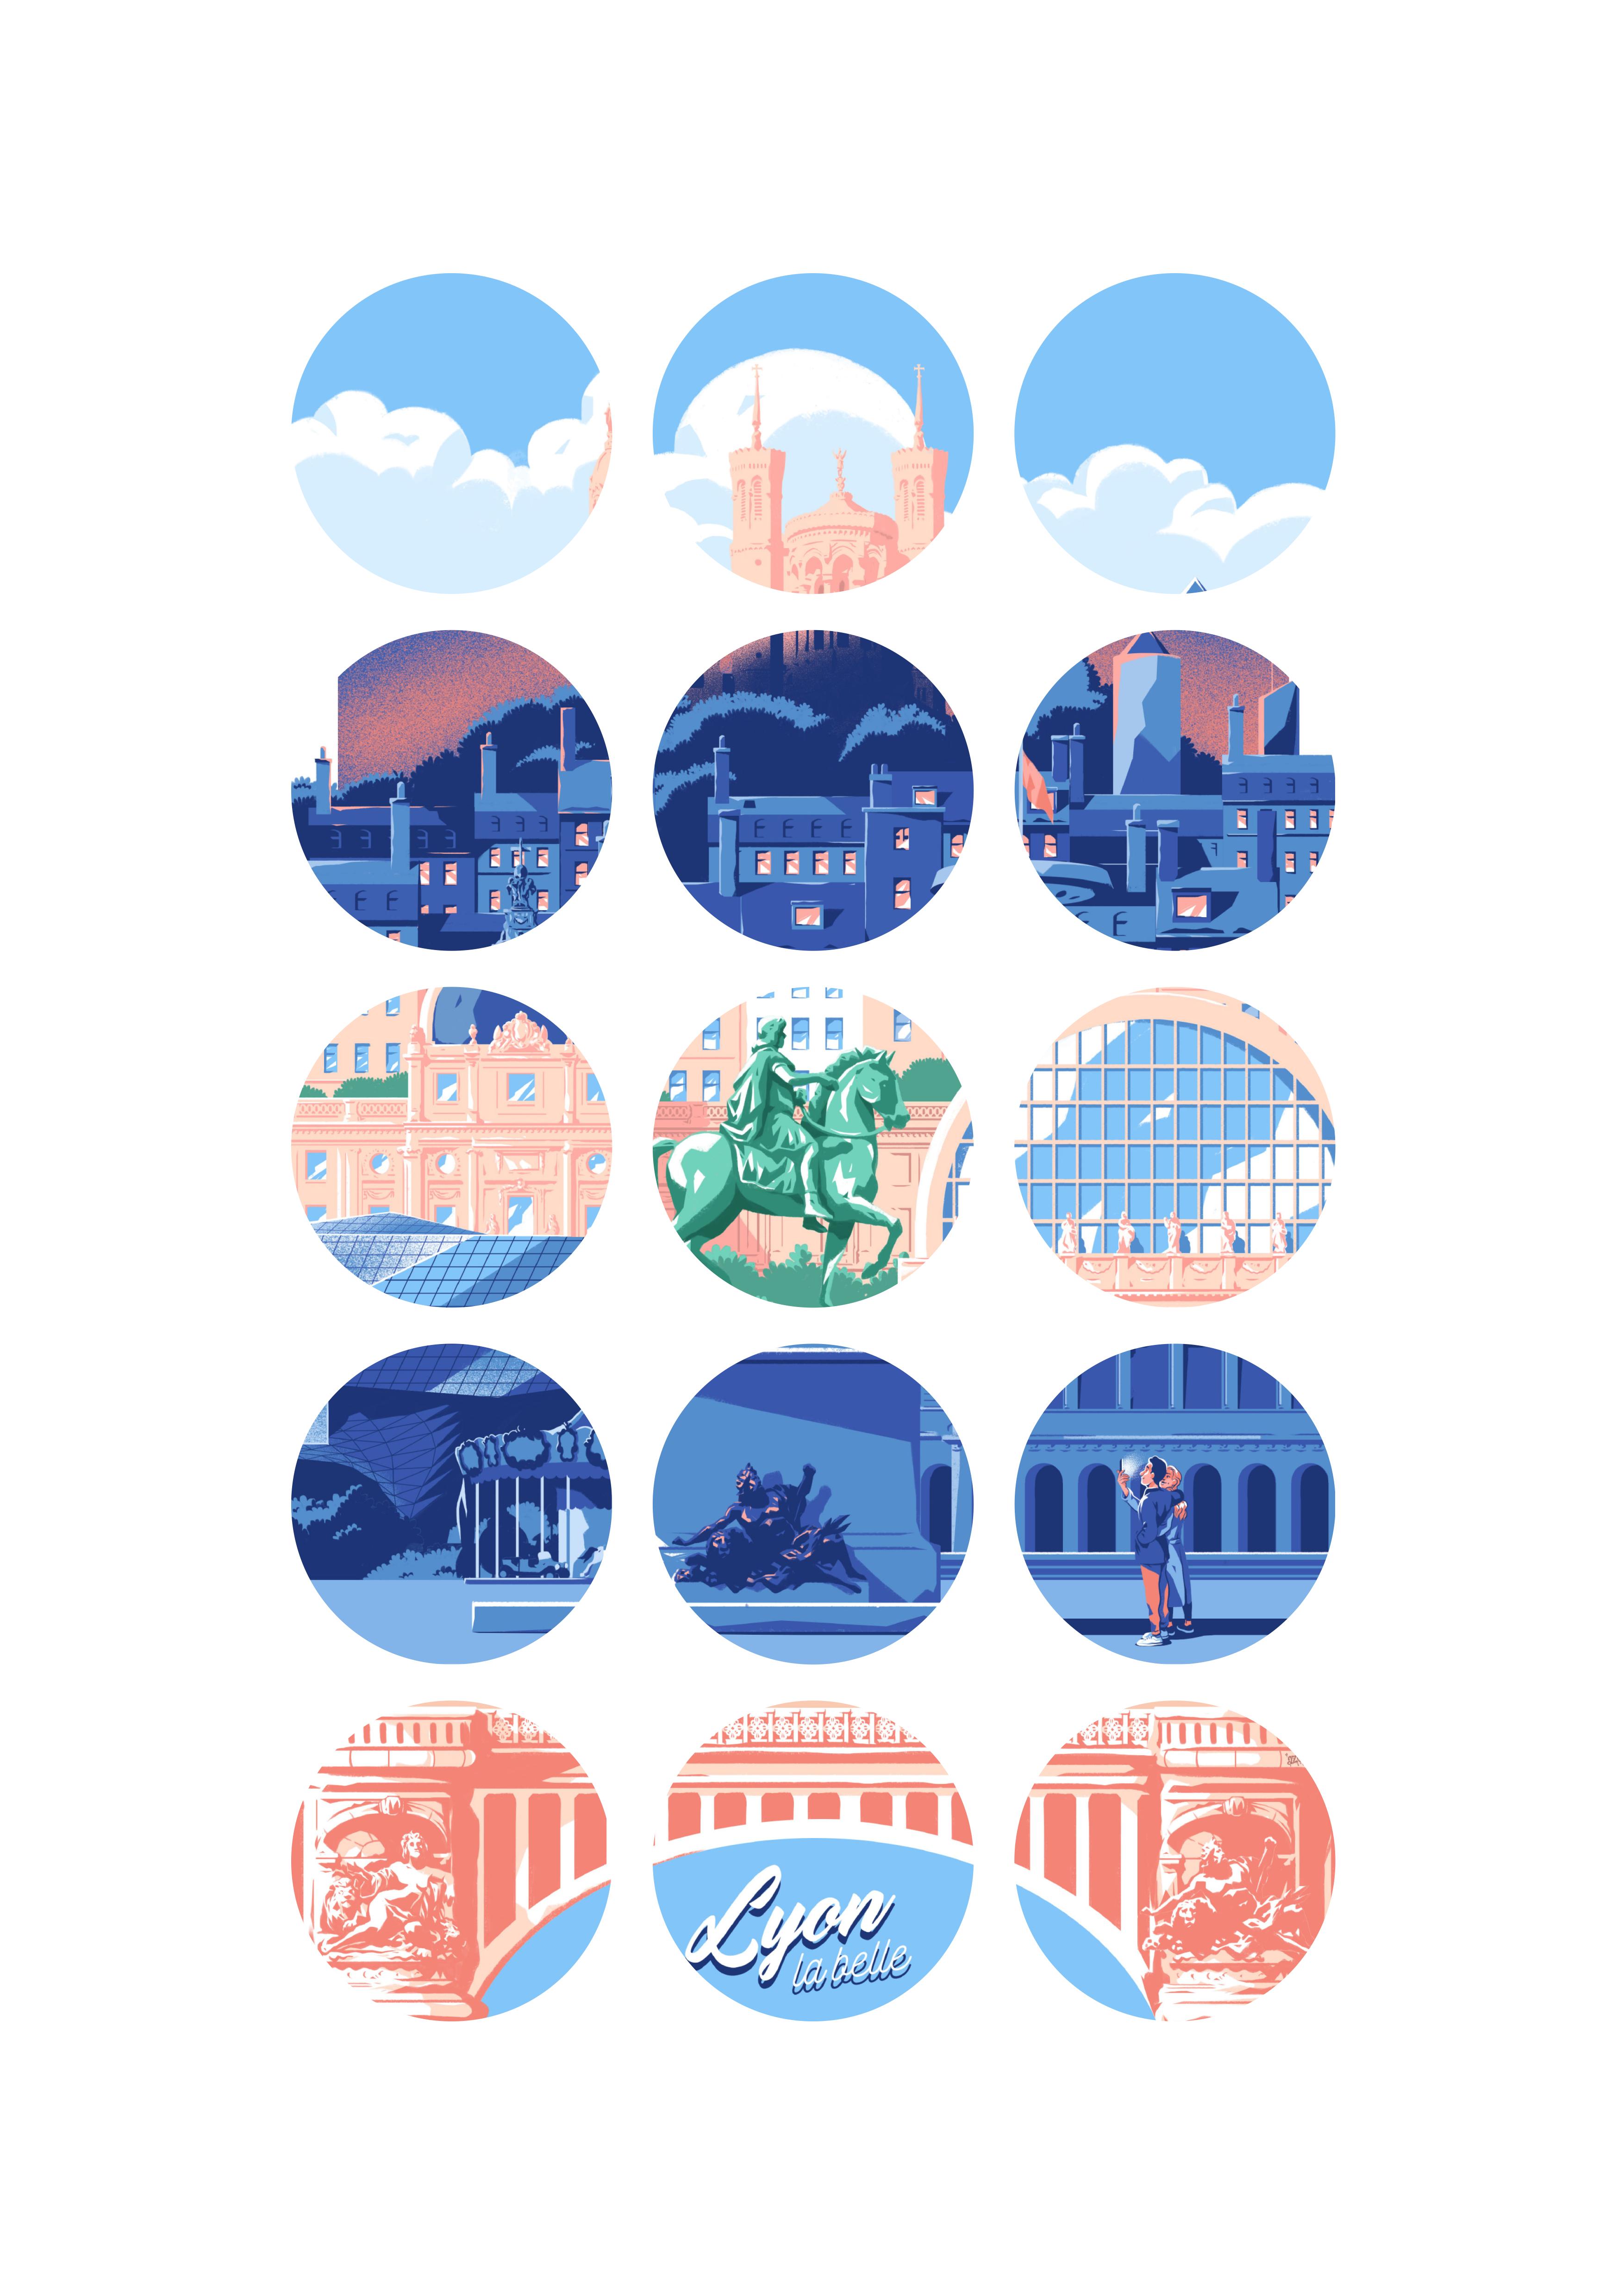 Lyon la belle, zoom illustration